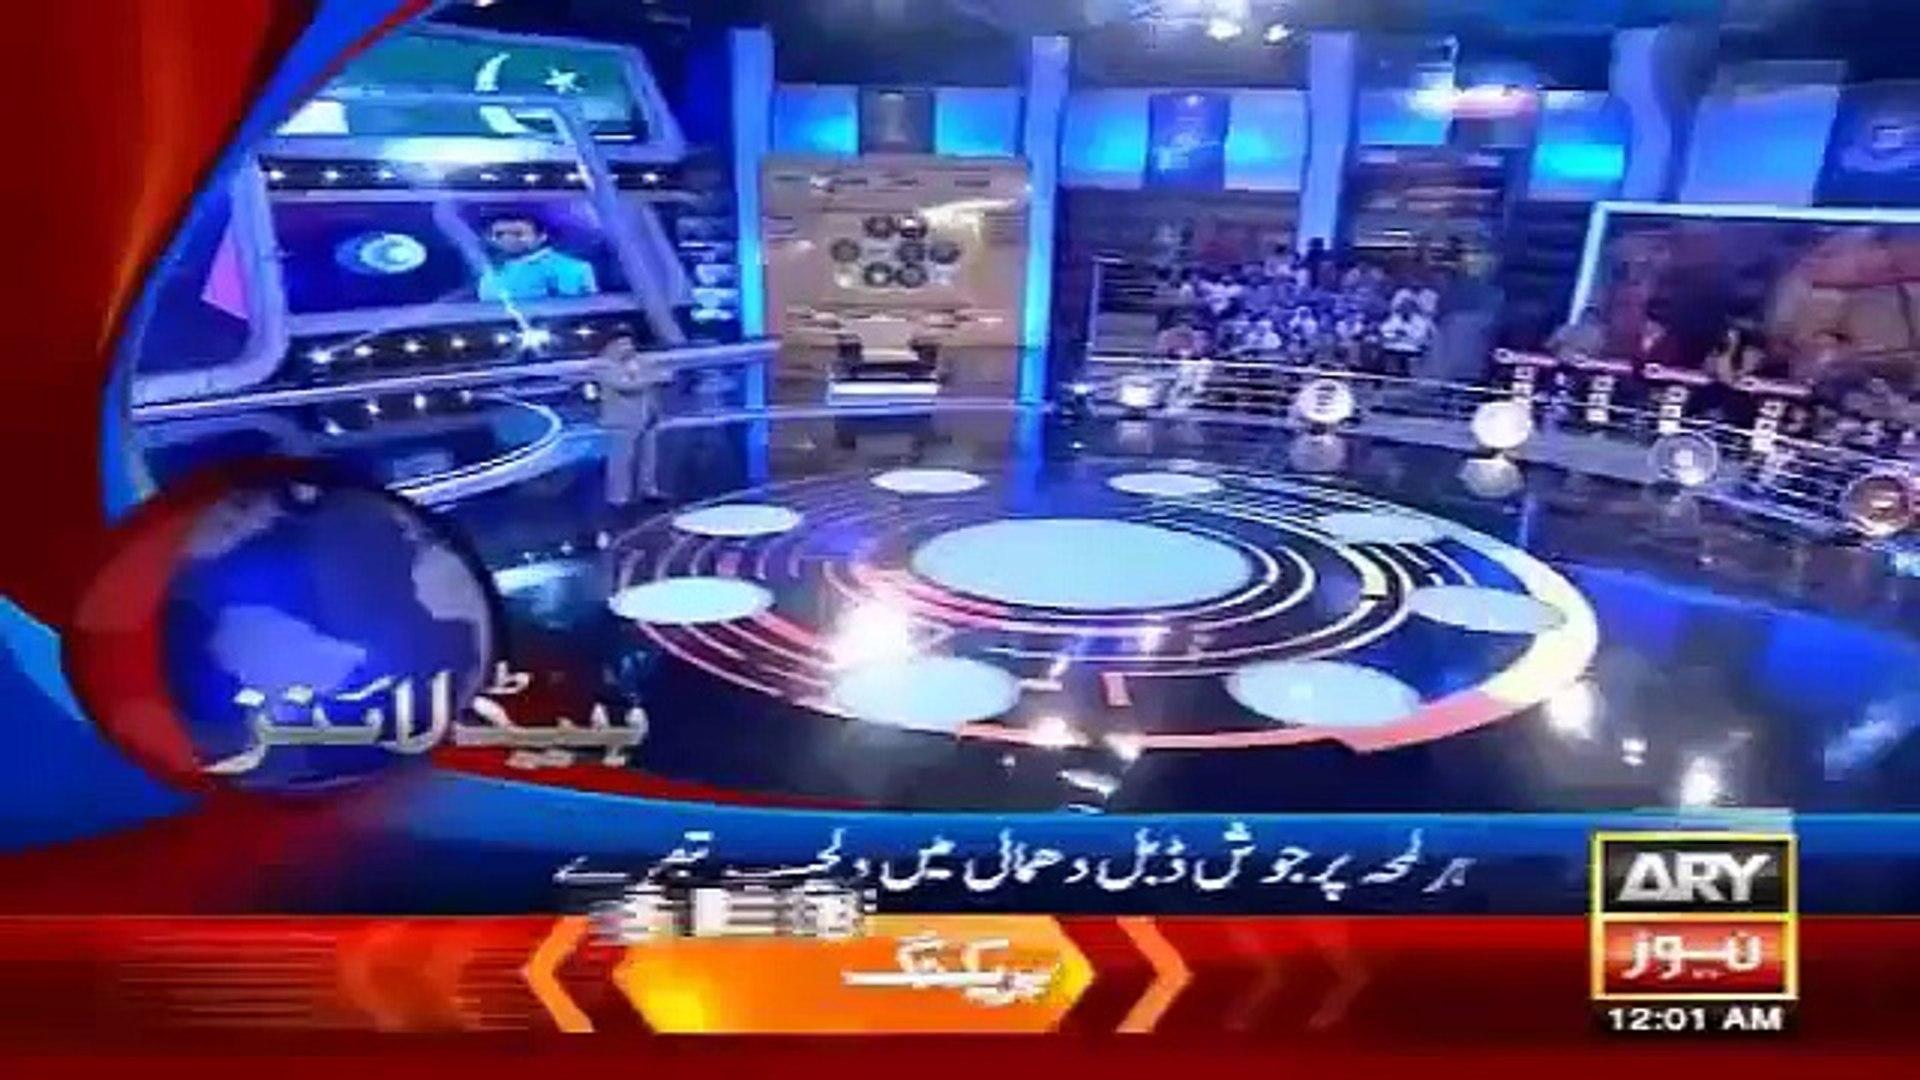 The News - Ary News Headlines - 19 March 2016 - 0000 - Pakistan News -  Latest News